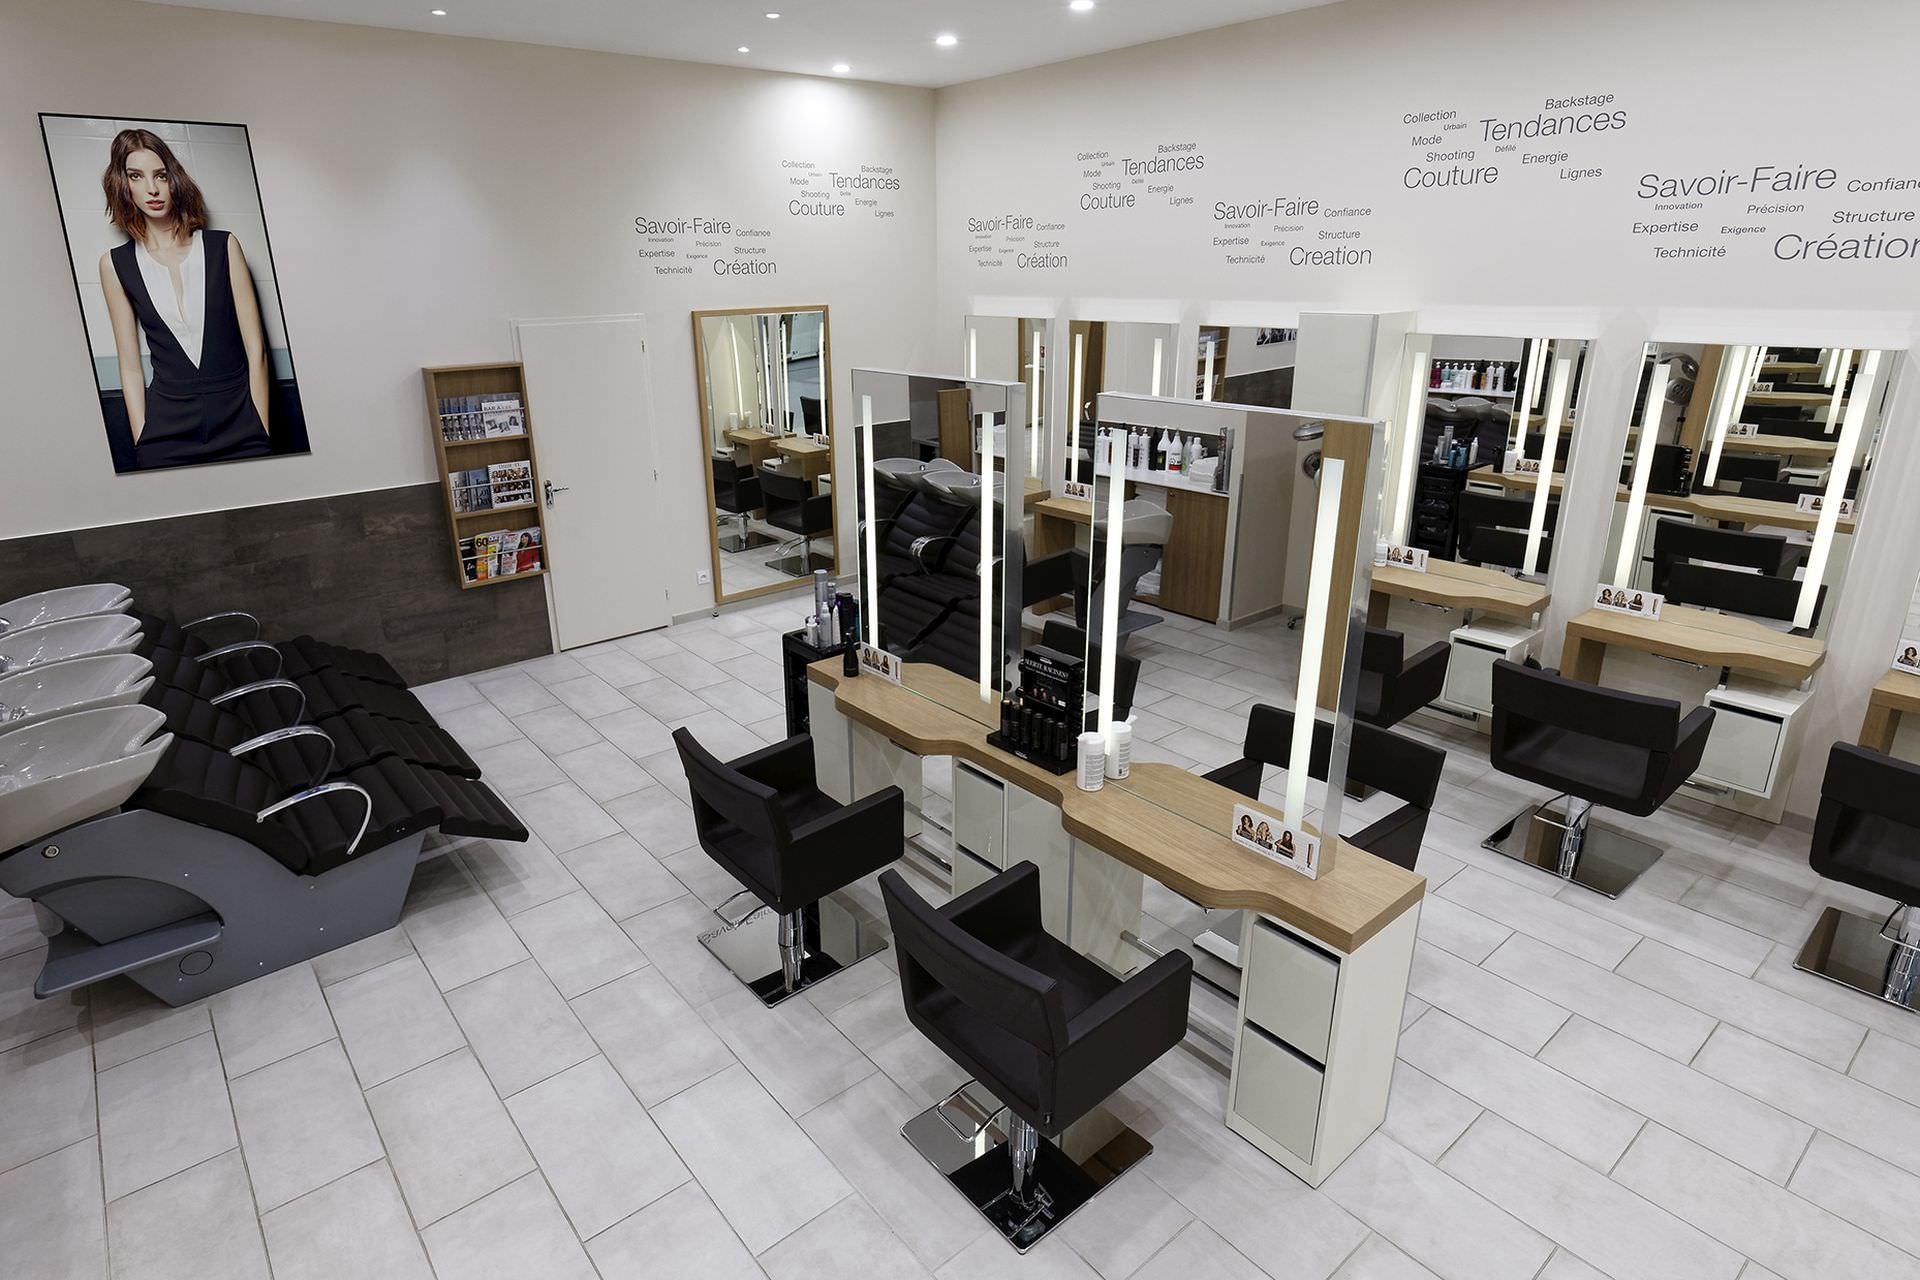 renovation-salon-coiffure-jean-louis-david-003